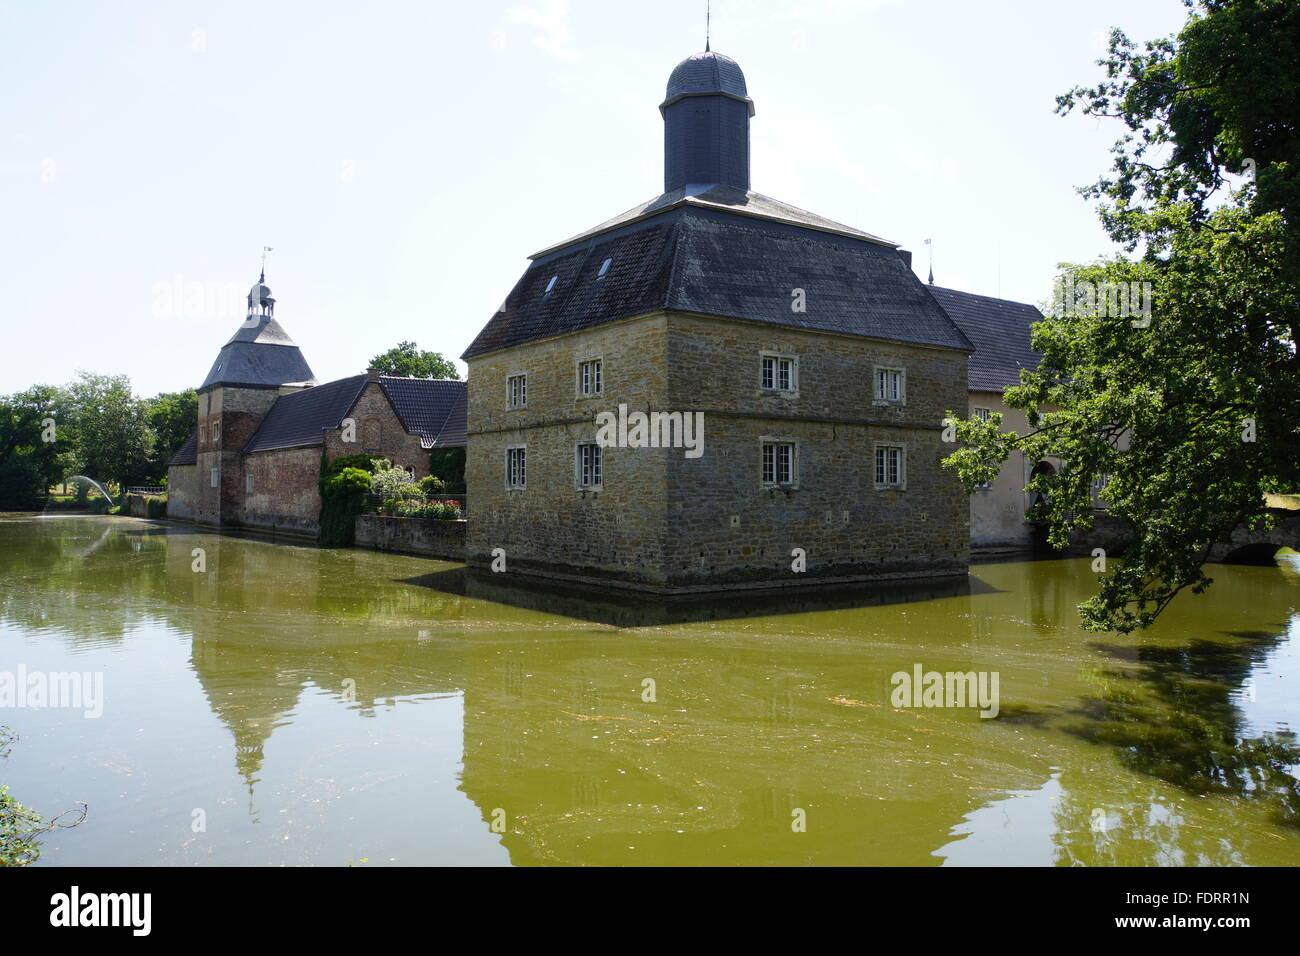 Castle Westerwinkel - Stock Image